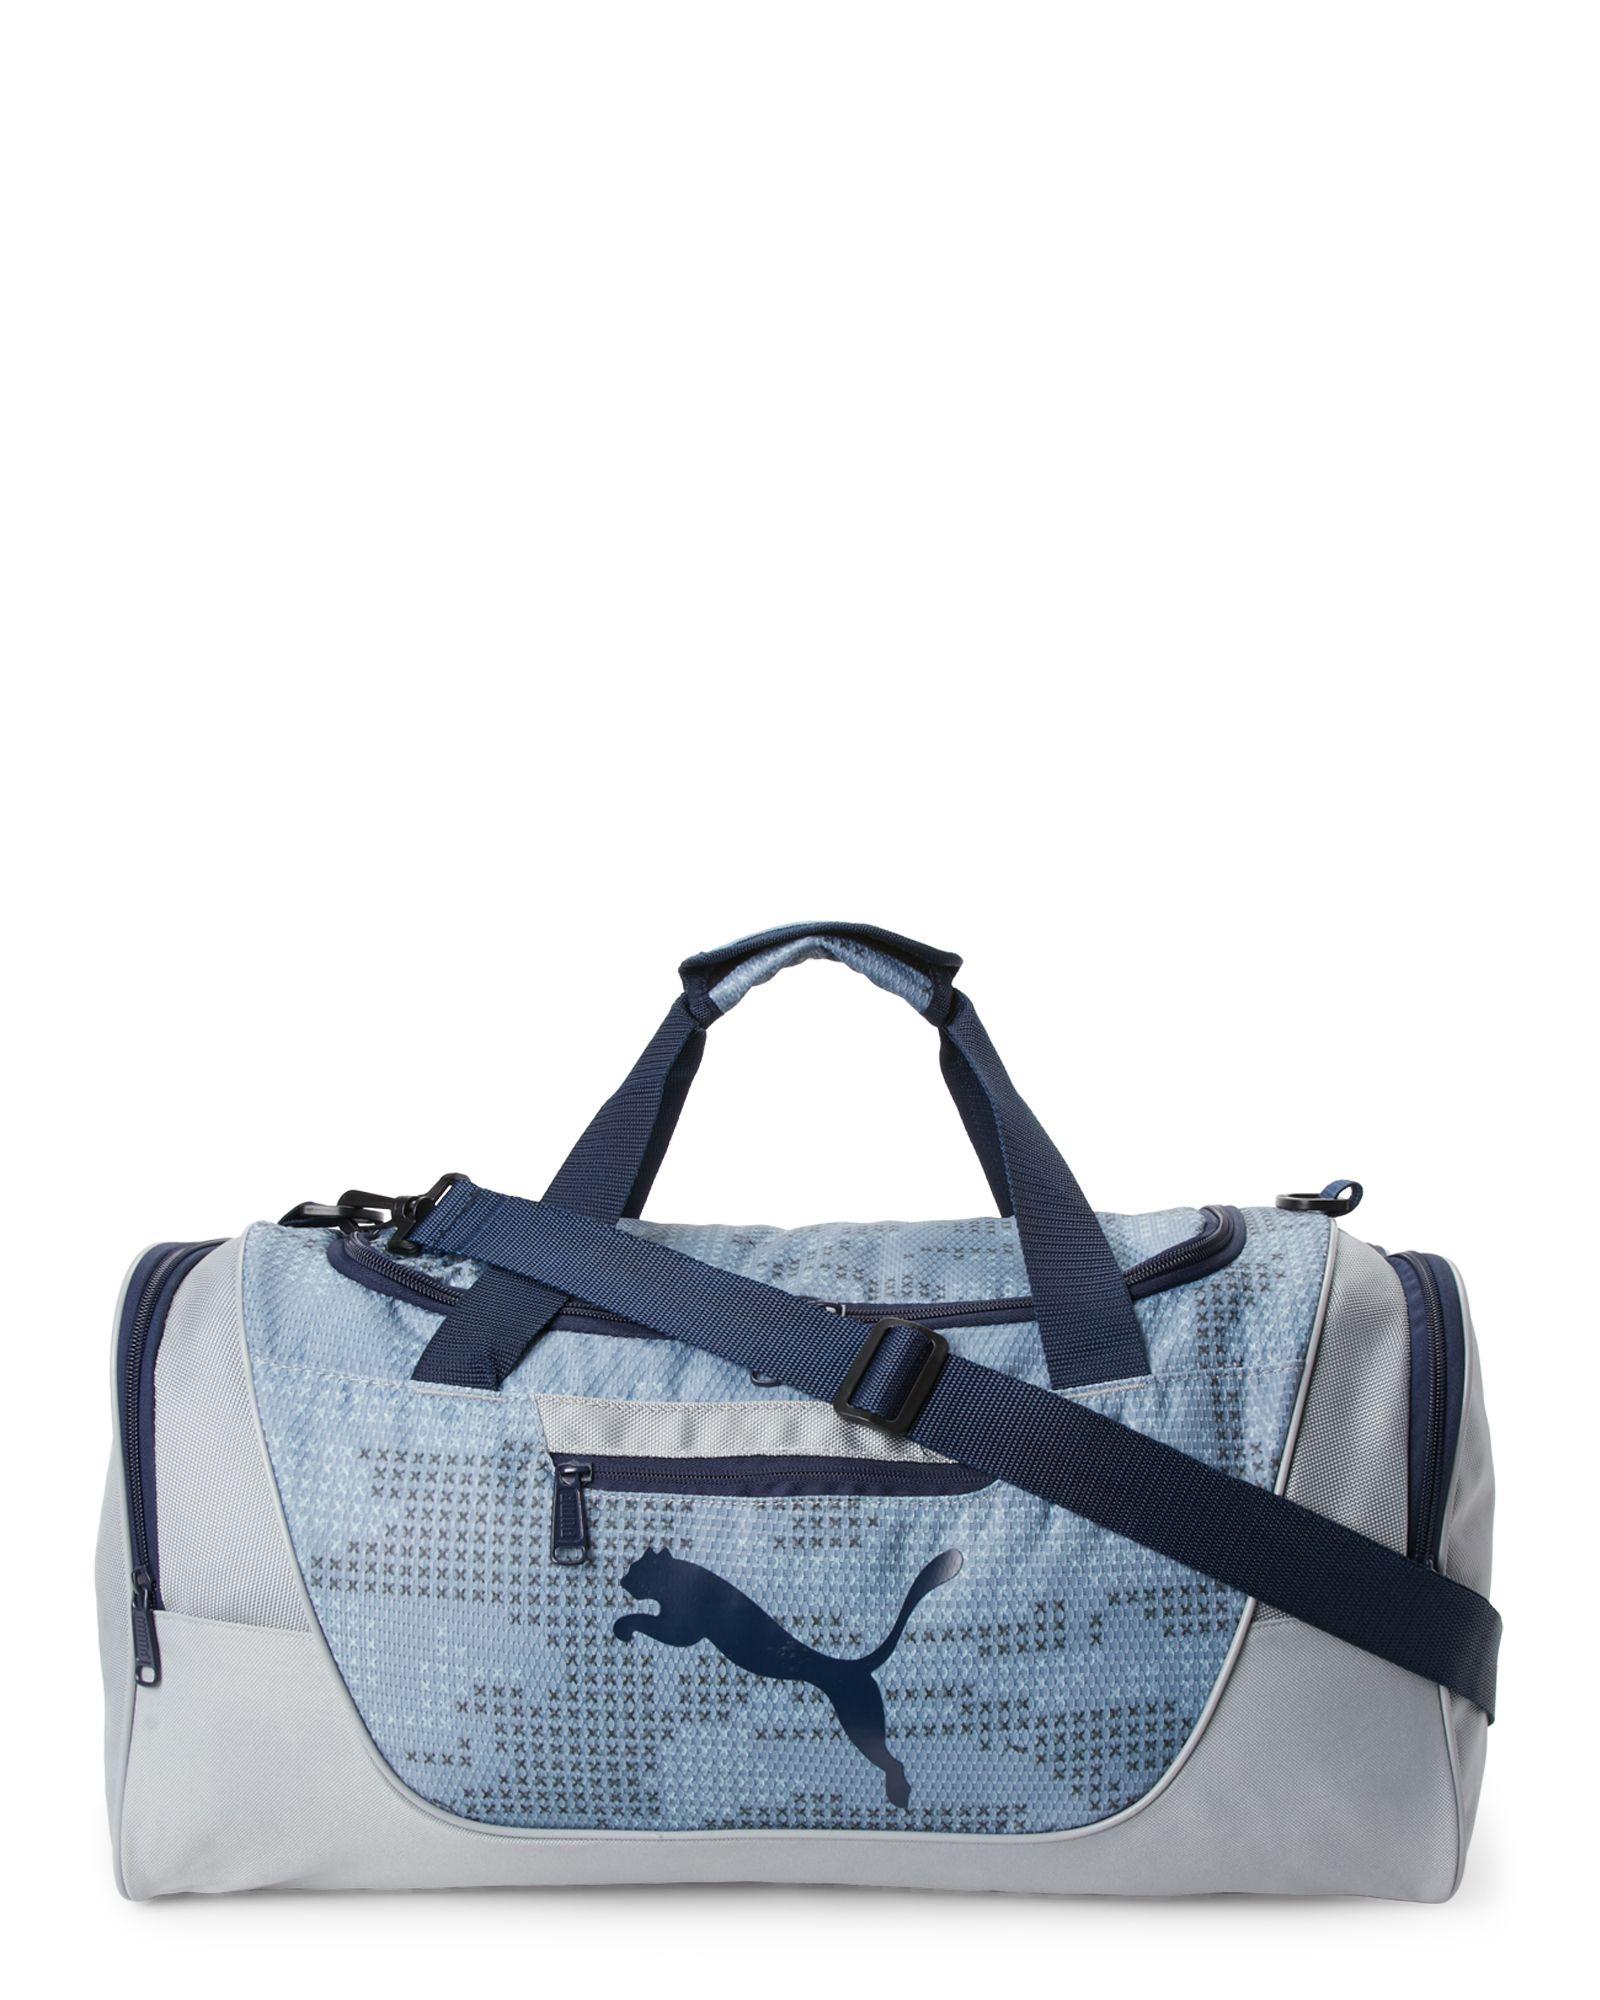 bba1ea94f Puma Grey Contender Duffle | *Luggage & Bags* | Bags, Luggage bags ...